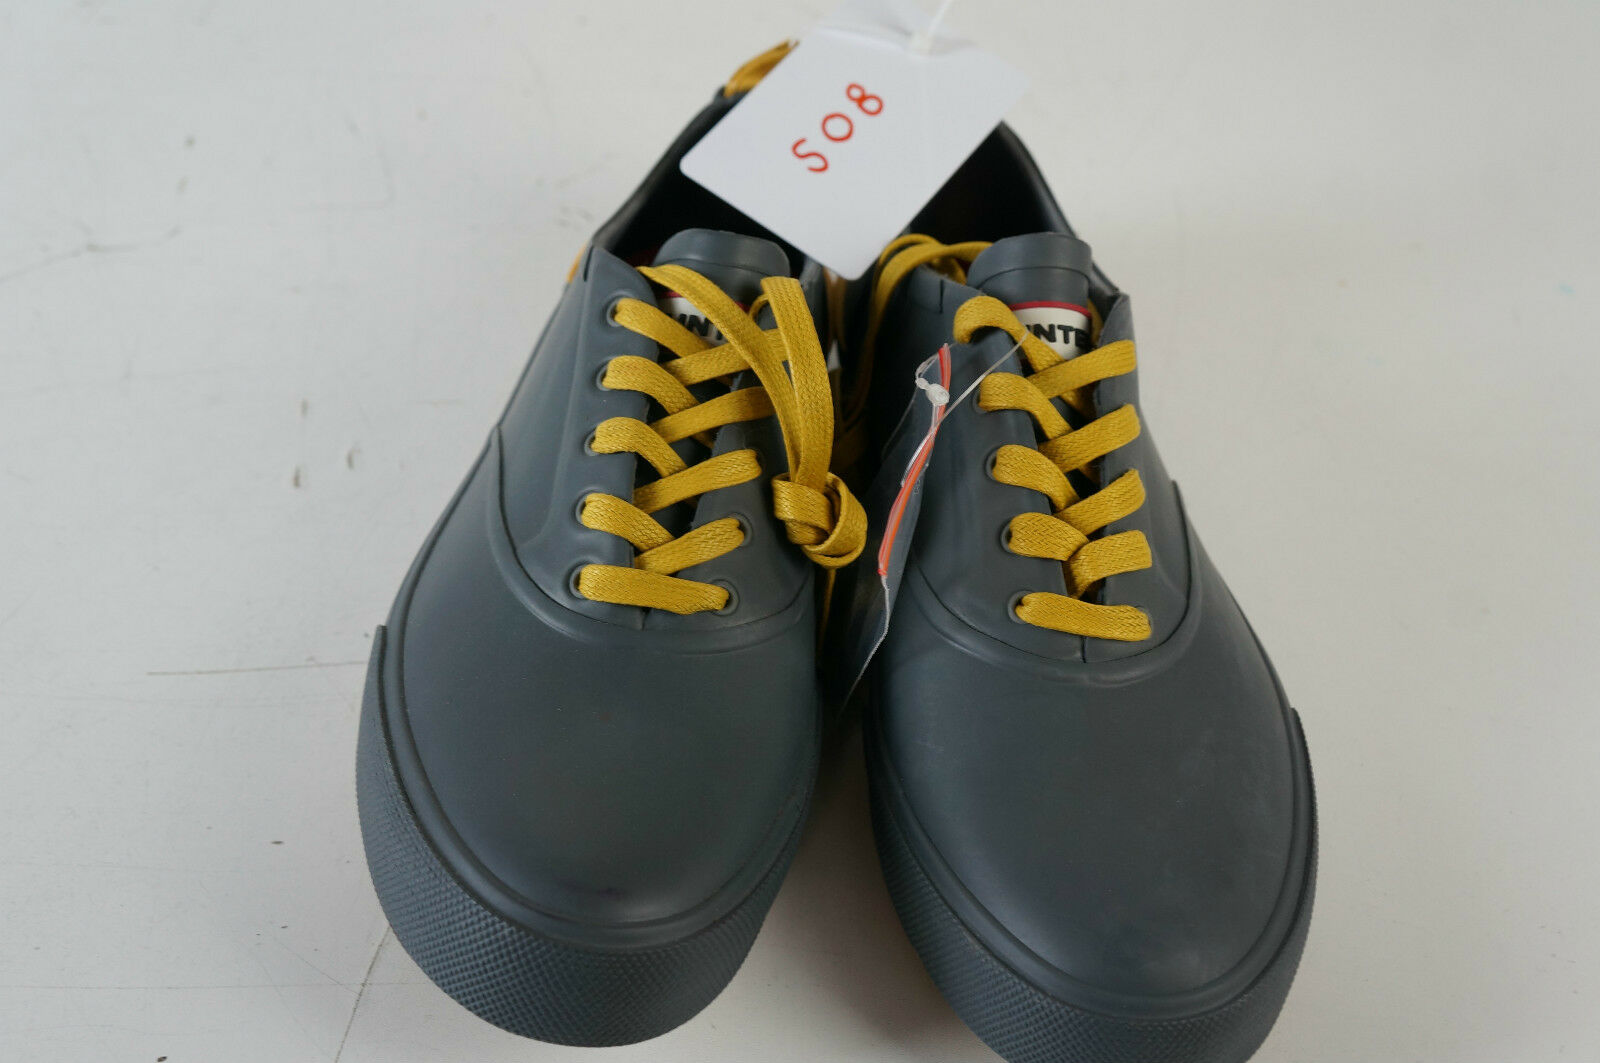 HUNTER Sneaker Gummi grau Details gelb  UK 5 EUR 38 508